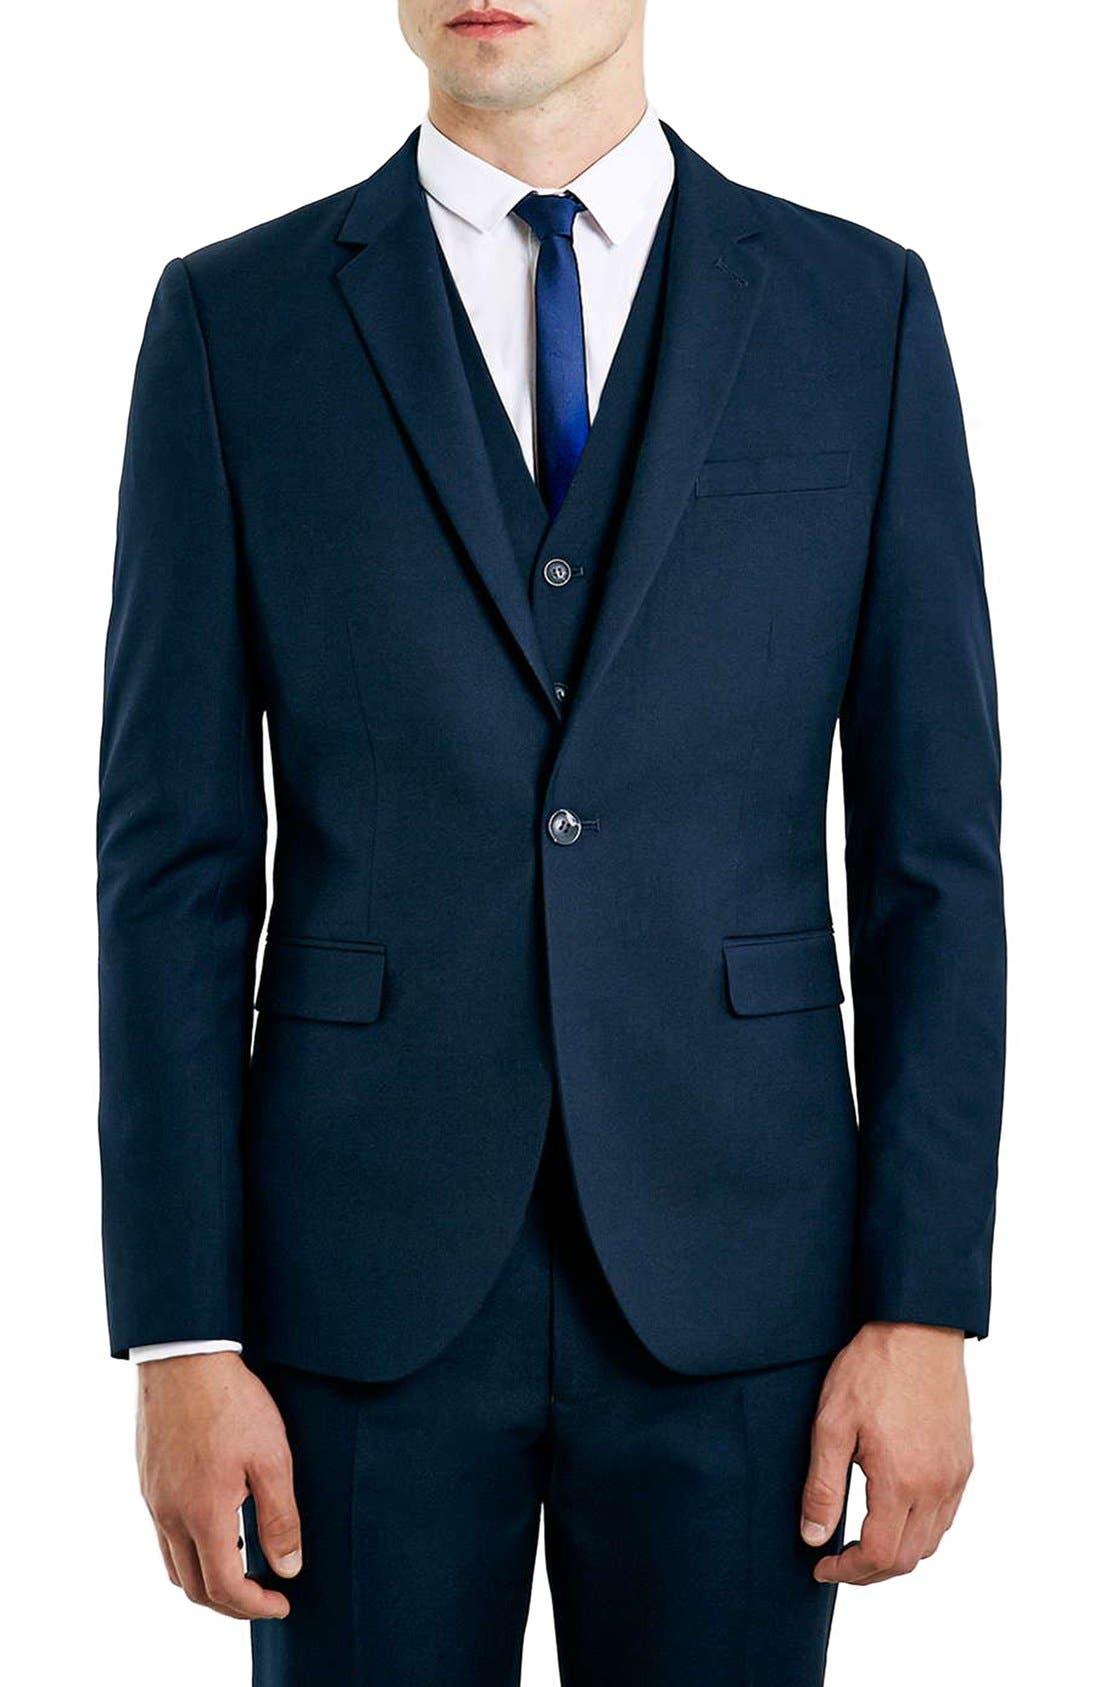 Main Image - Topman Navy Skinny Fit Suit Jacket